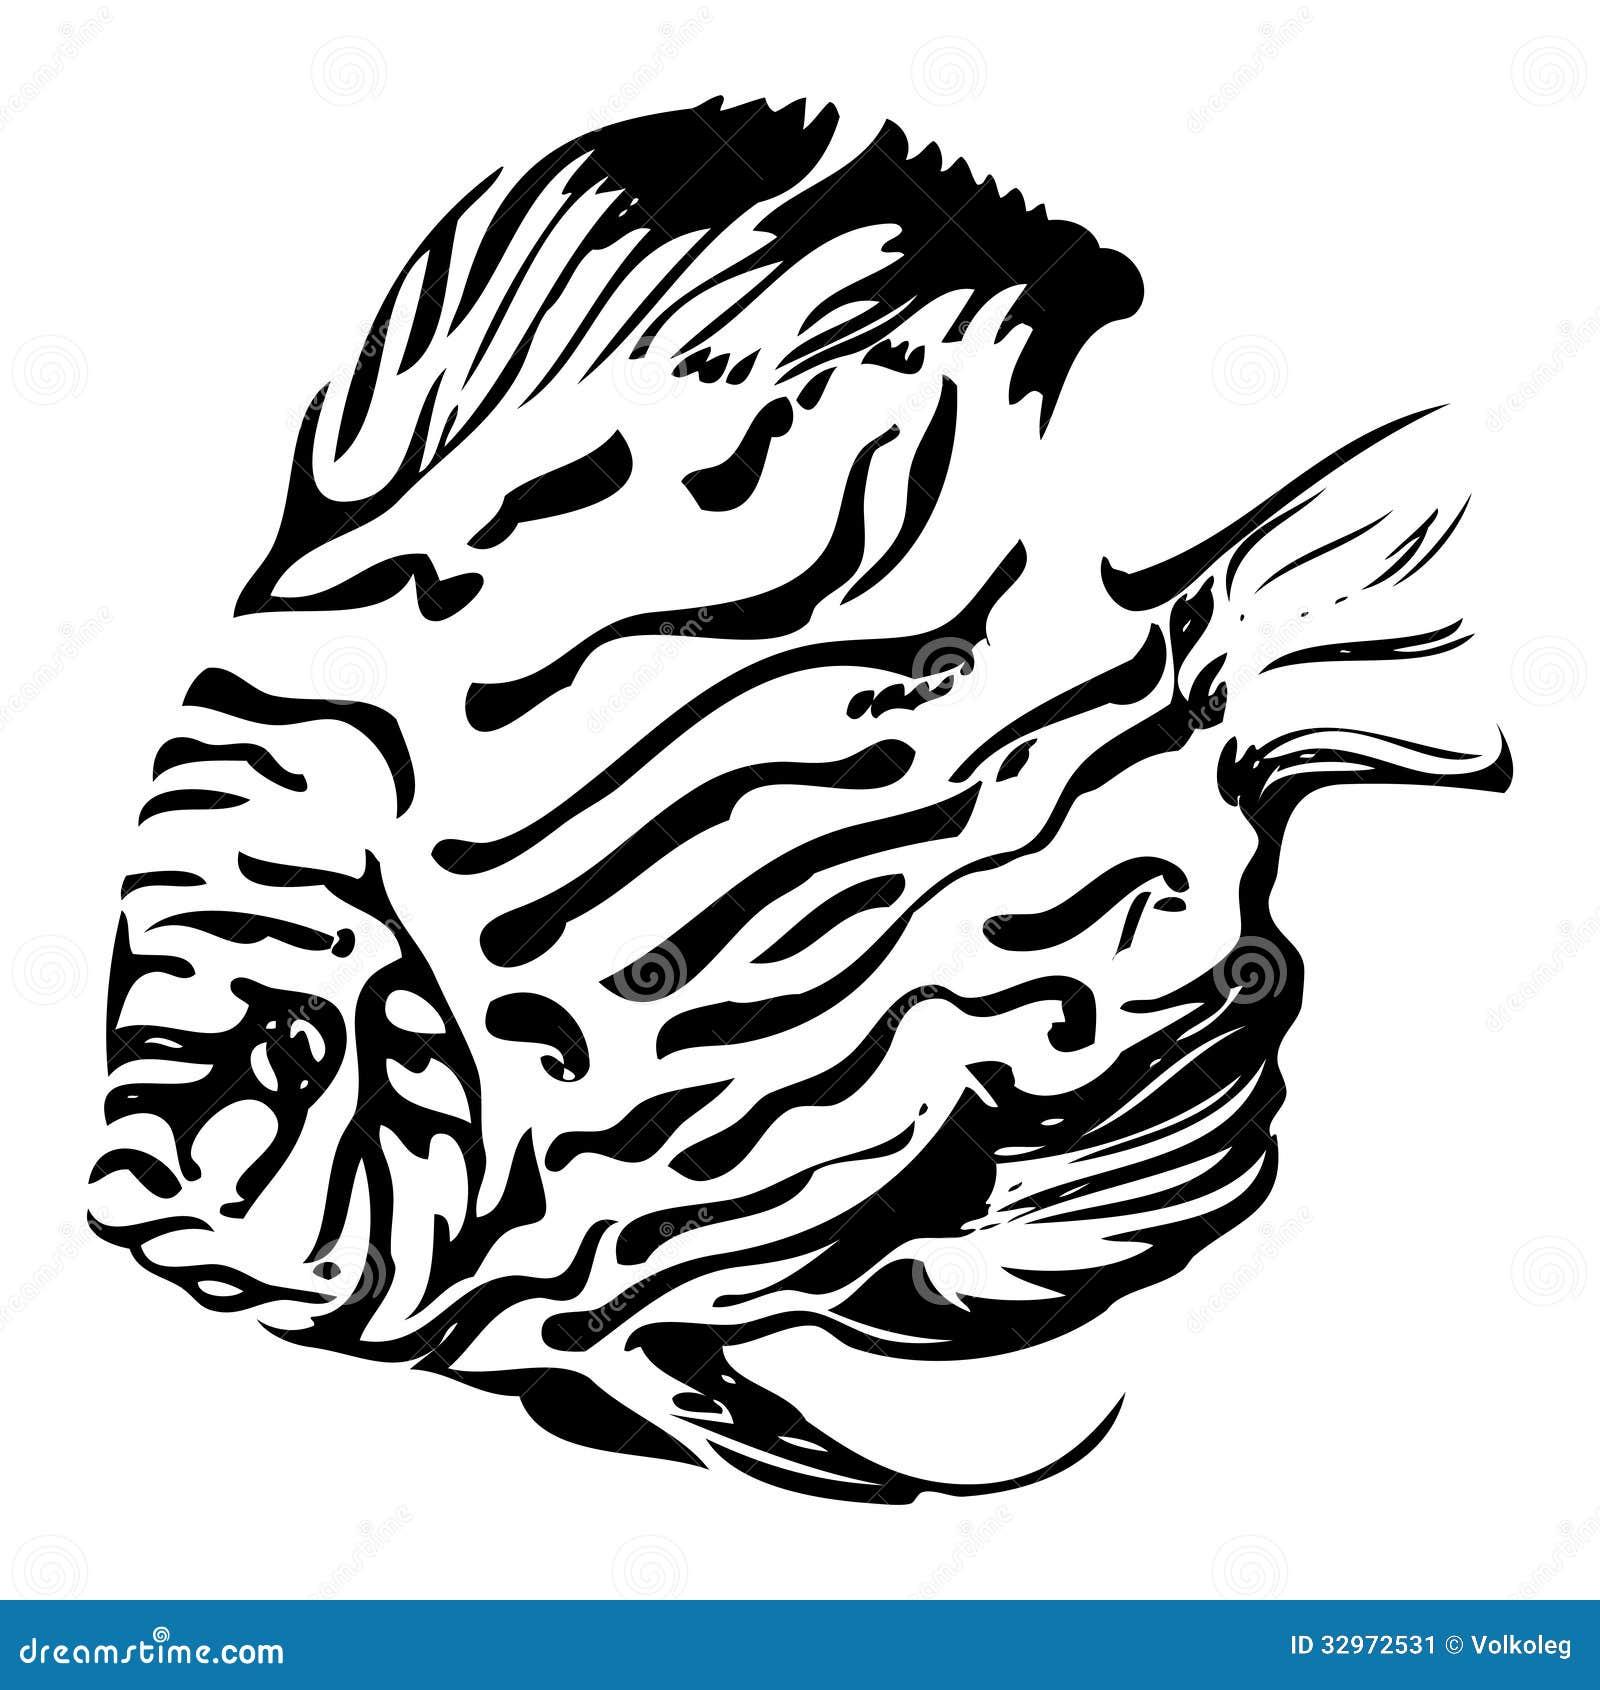 Tyson face tattoo besides Confederate Motors further Free Clipart Black And White Flower Border furthermore Wedding Clip Art also E5 BA 93 E5 AD 98 E5 9B BE E7 89 87  E5 BC 82 E4 B9 8E  E5 B8 B8 E7 9A 84 E7 8F 8A E7 91 9A E9 B1 BC  E7 99 BD E4 BC A0 E6 9F 93 E5 AA 92 Illustrat Image32972531. on art business